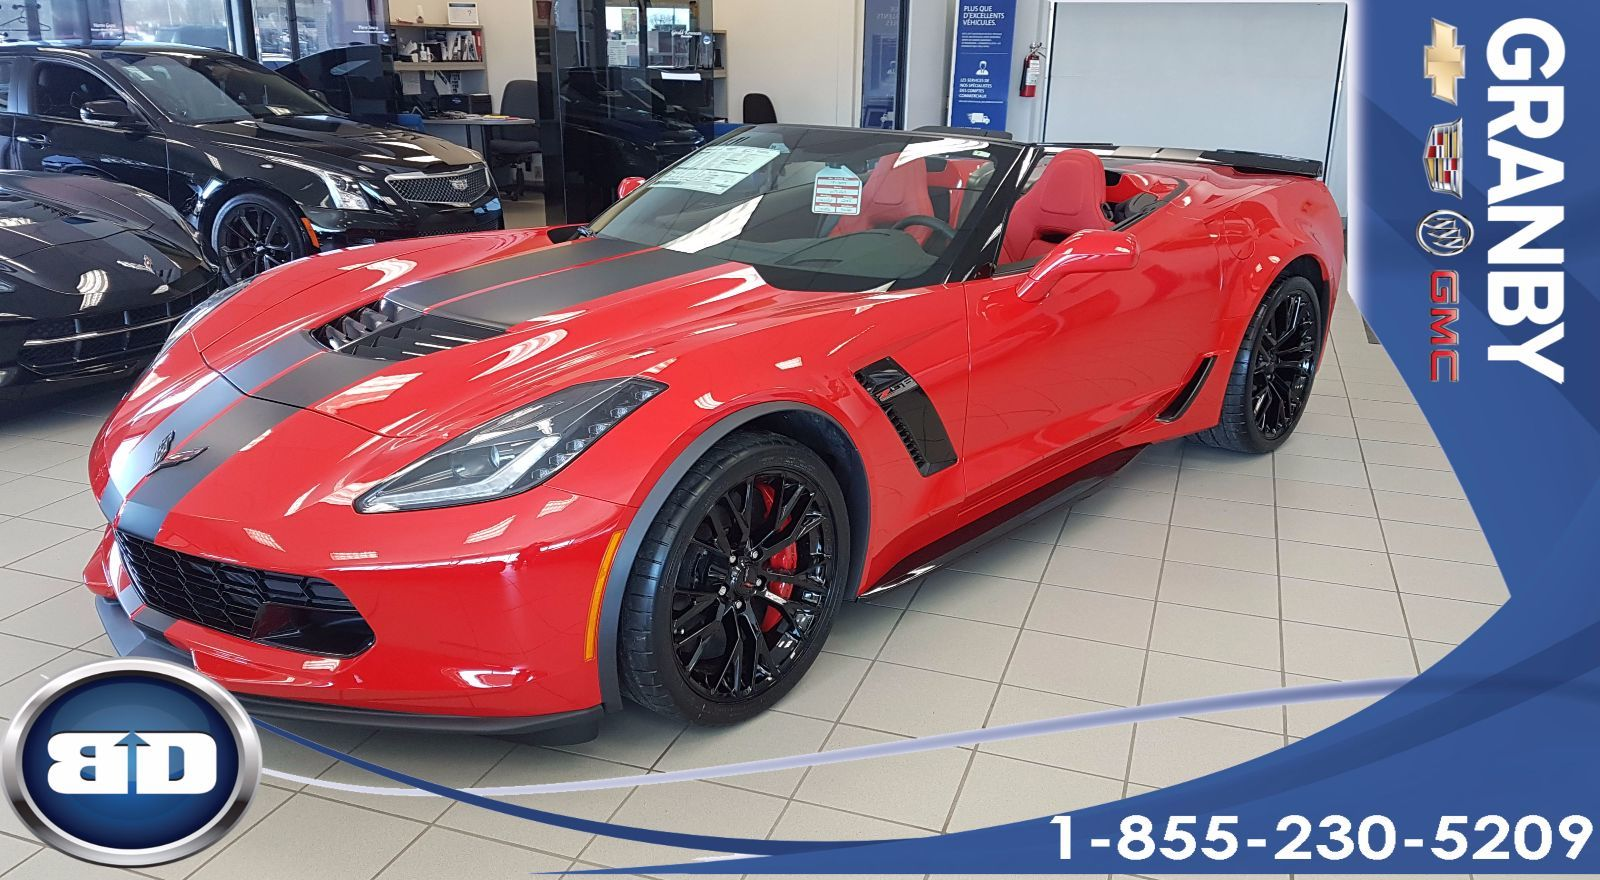 2017 chevrolet corvette z06 1lz convertible 650 hp d 39 occasion granby inventaire d 39 occasion. Black Bedroom Furniture Sets. Home Design Ideas